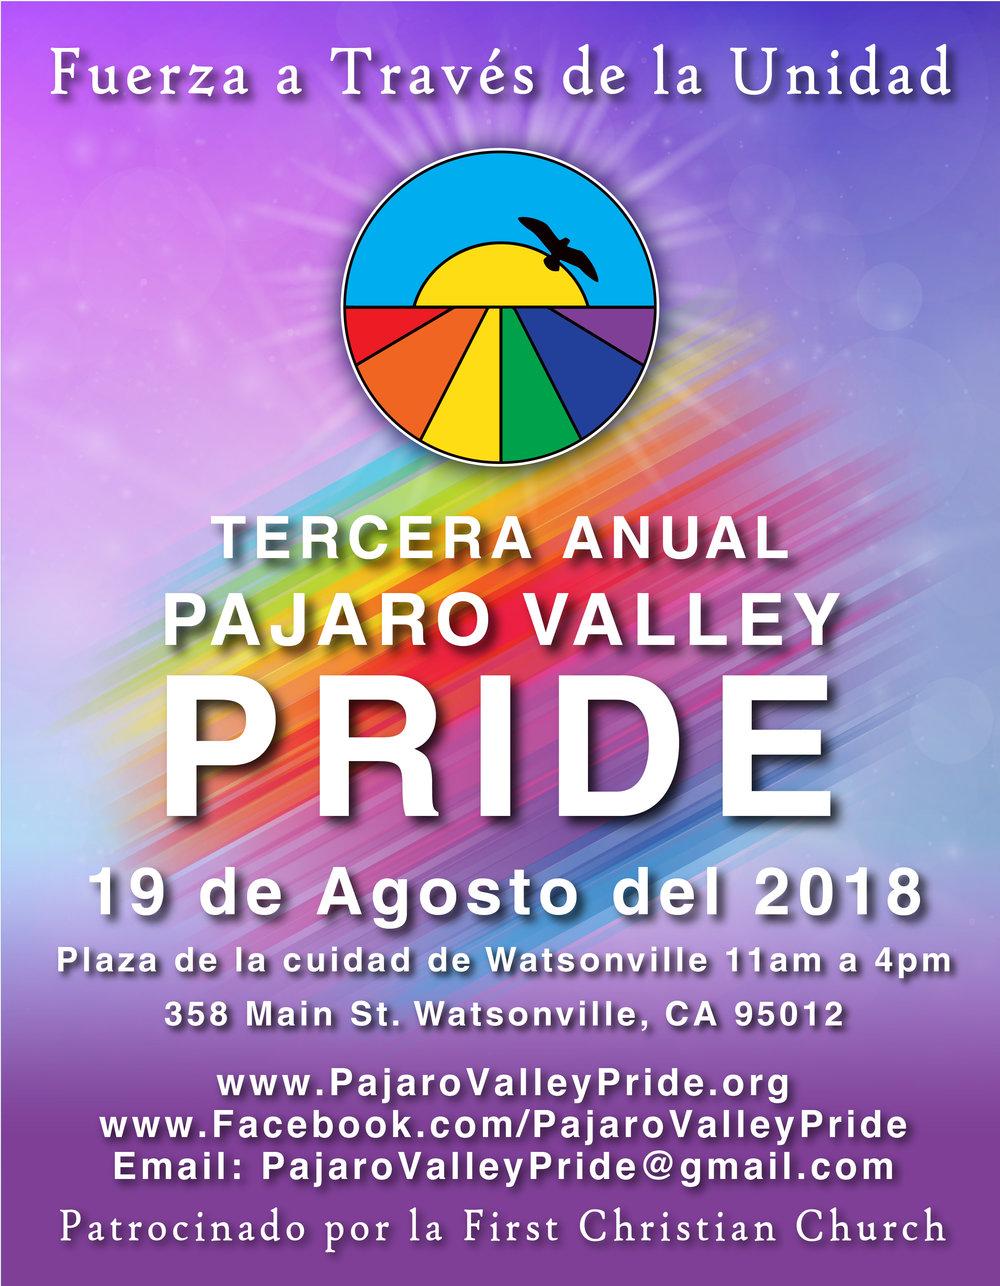 2018 PVP Pride-Spanish-Front.jpg